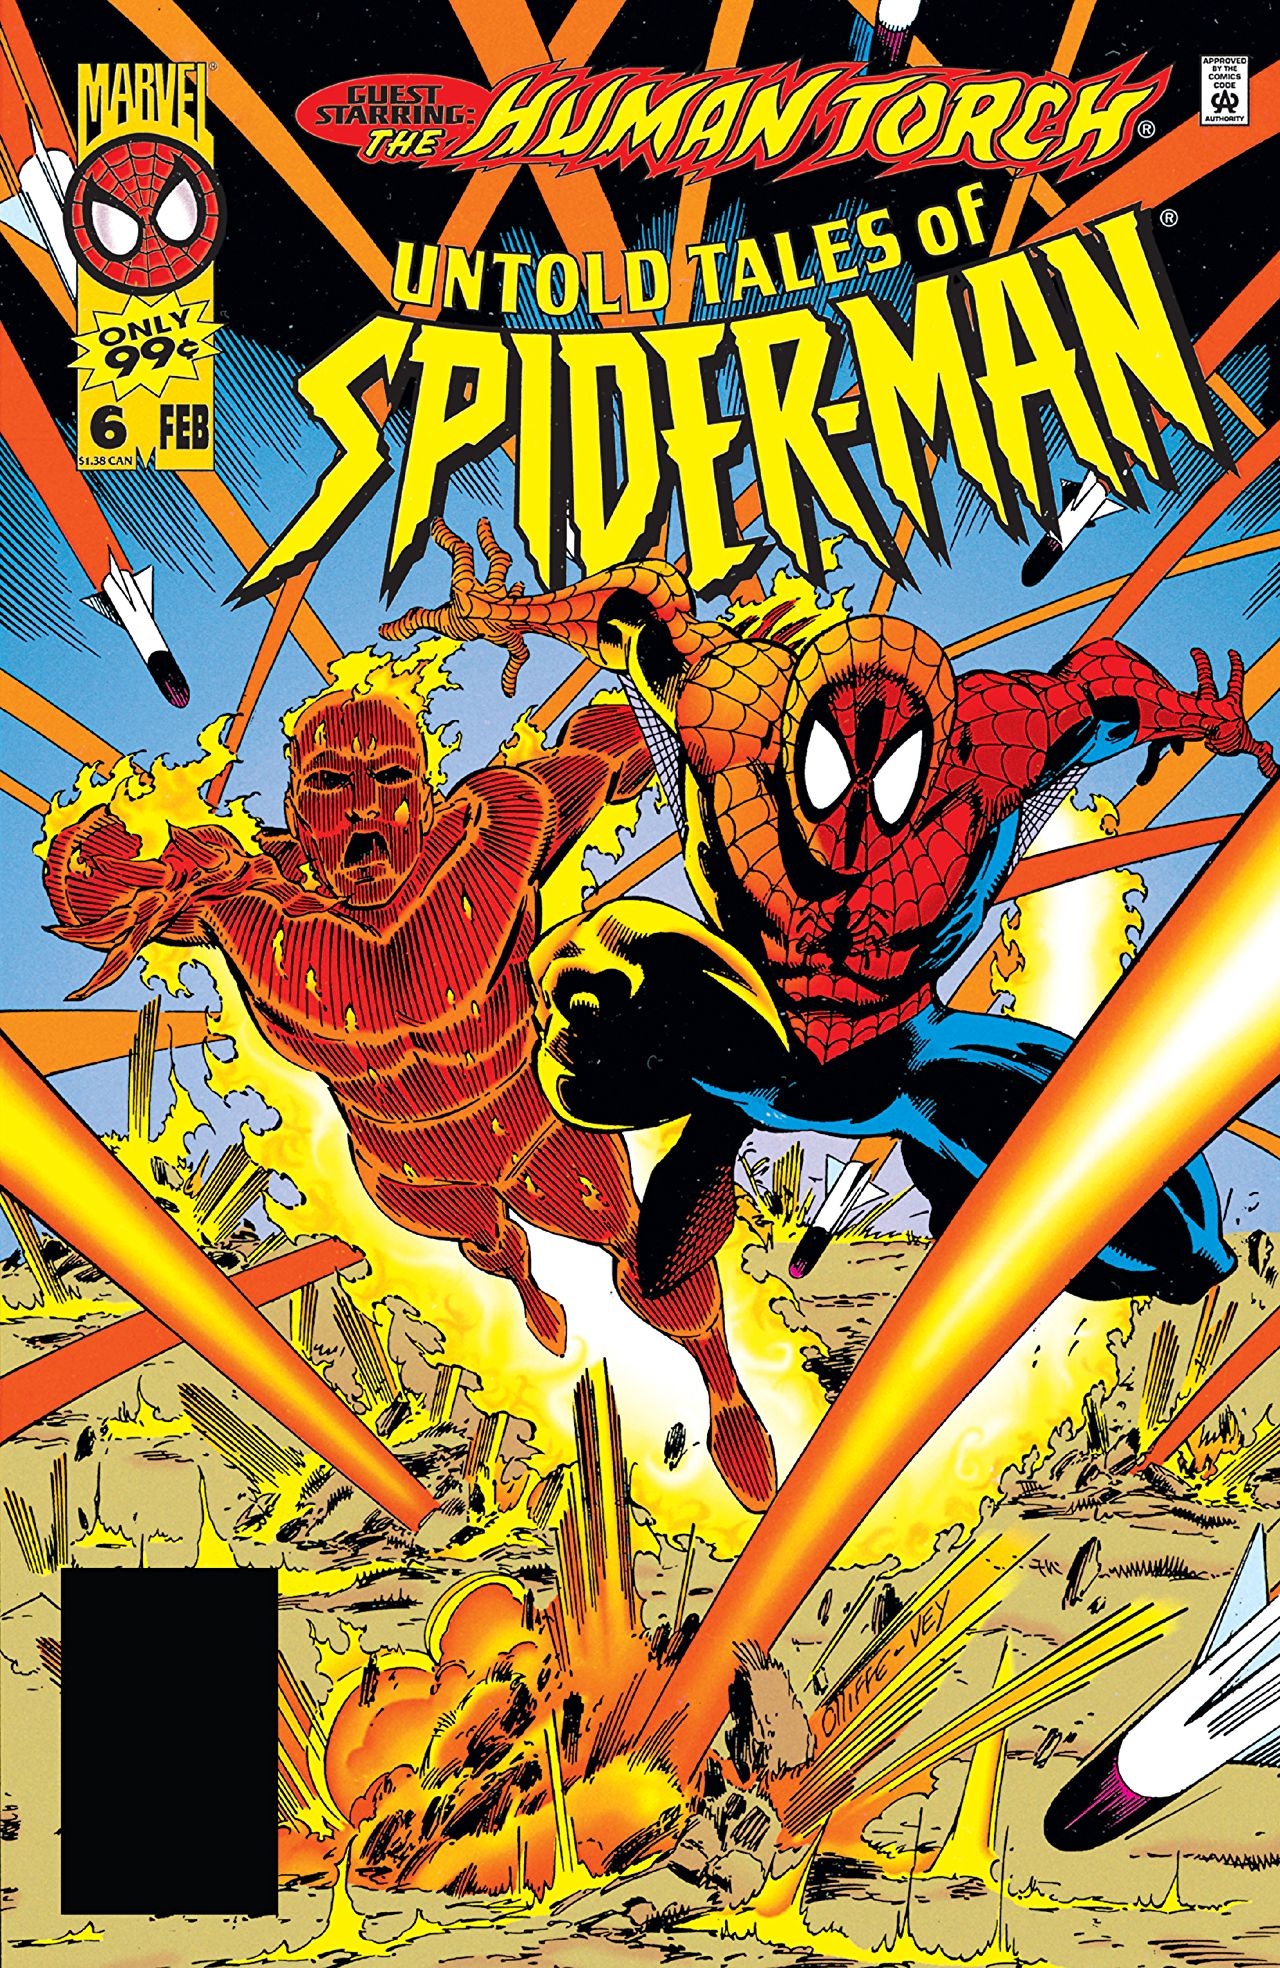 Untold Tales of Spider-Man Vol 1 6.jpg